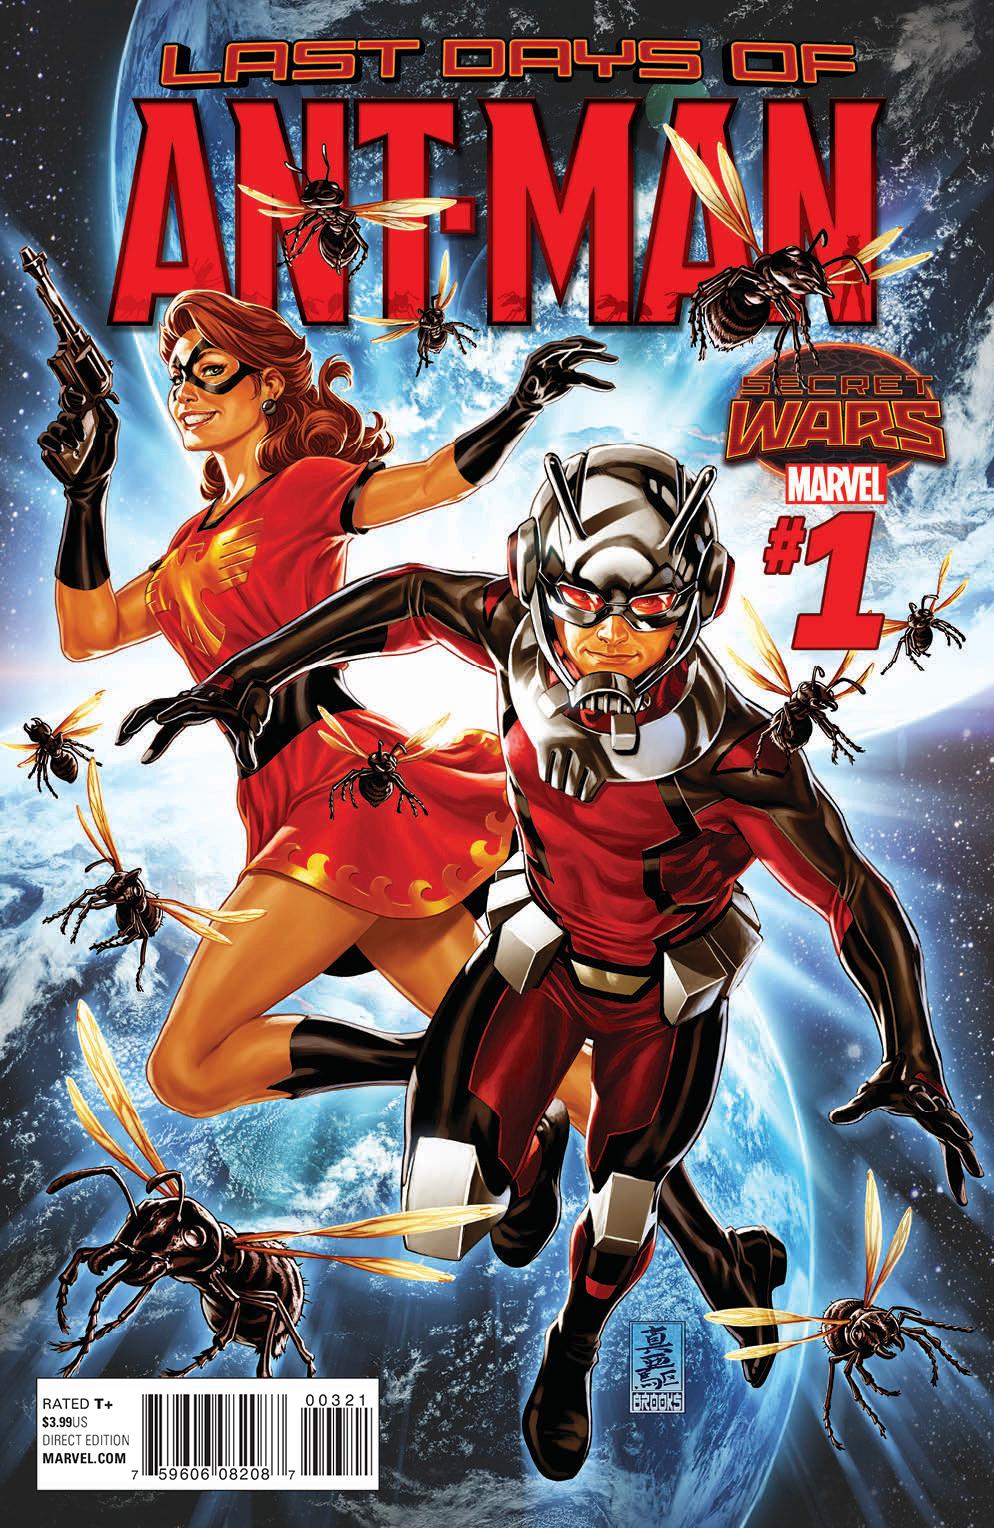 Ant-Man: Last Days Vol 1 1